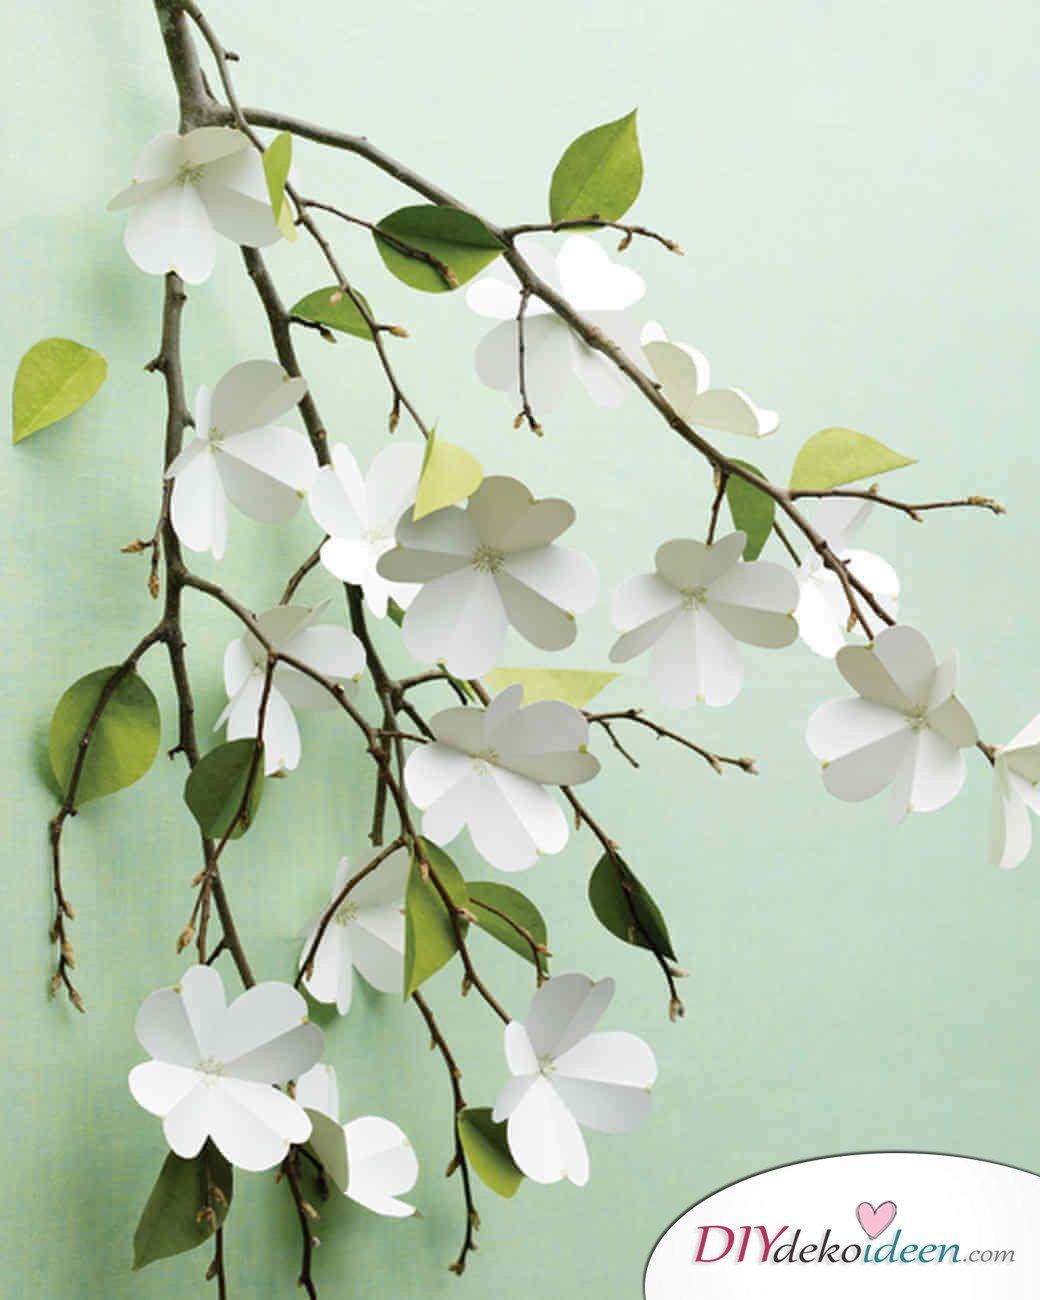 DIY Ideen - Frühlingsdeko selbst gestalten - Weiße Hartriegel-Blüten